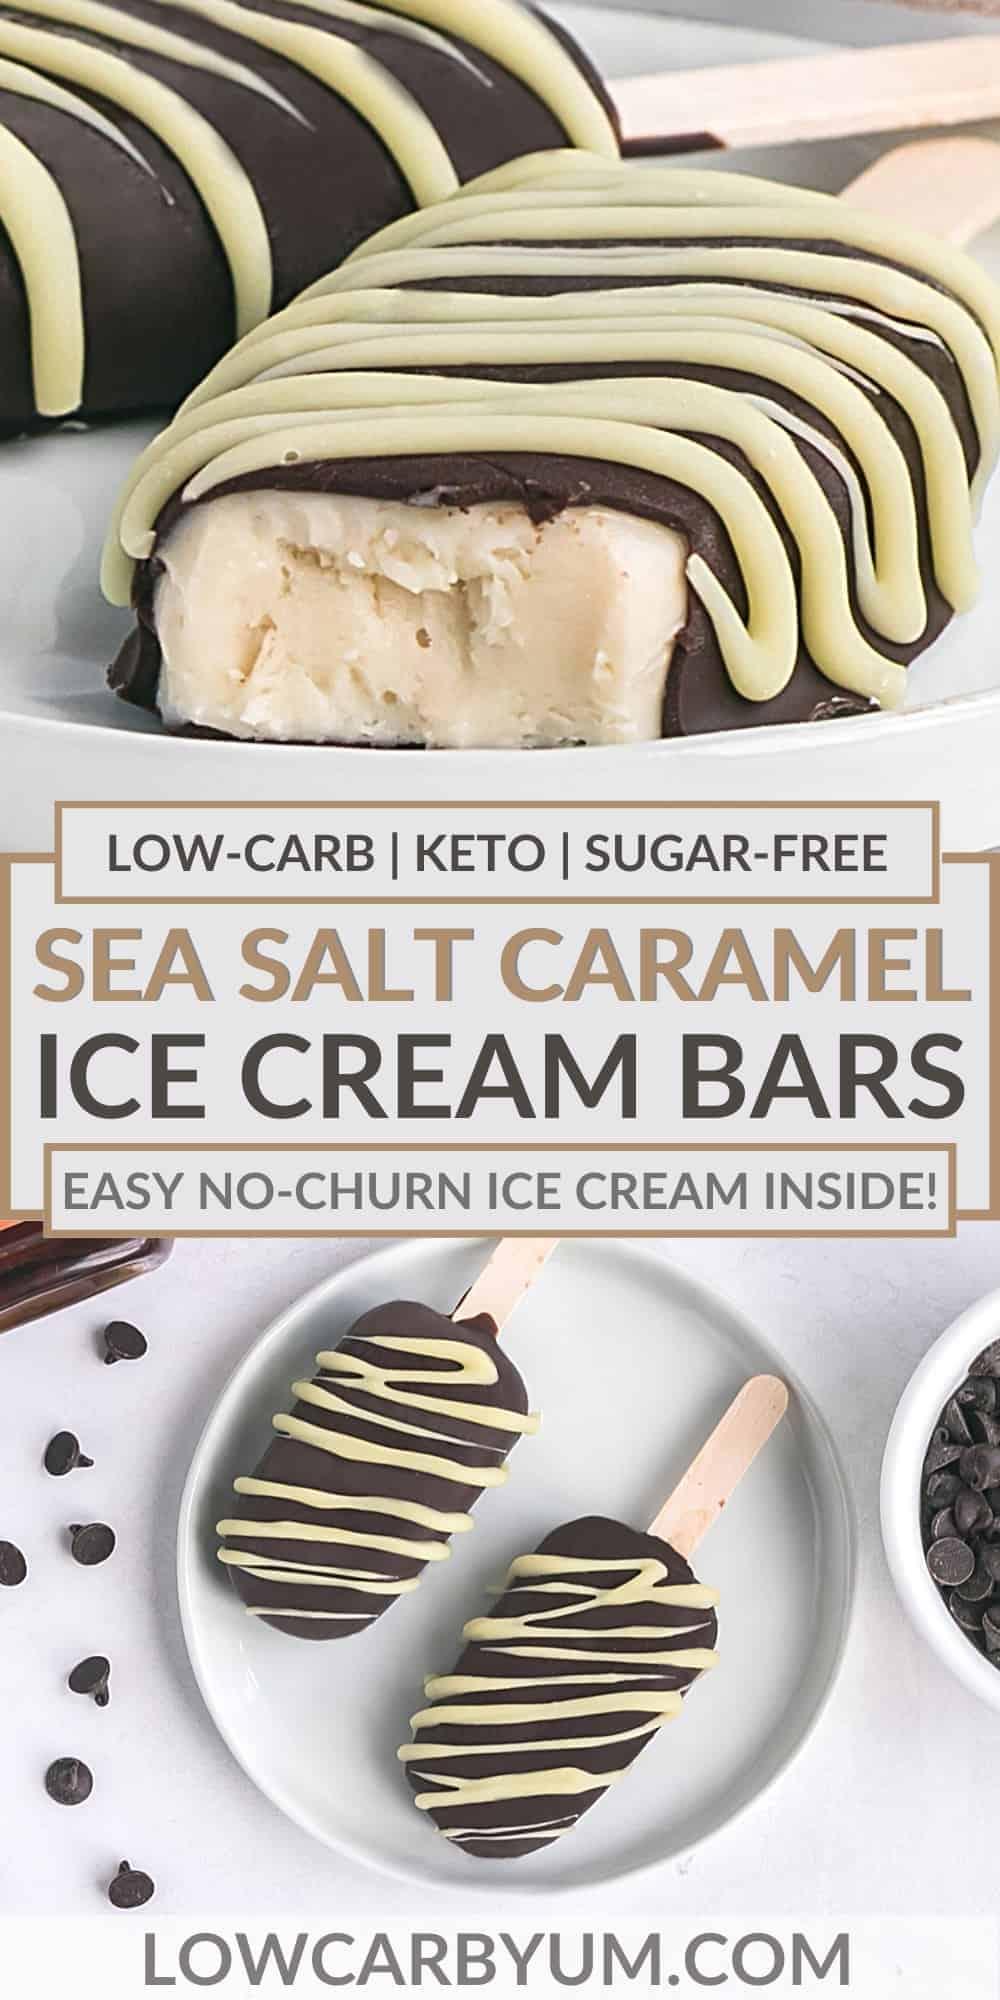 sea salt caramel ice cream bars pinterest image